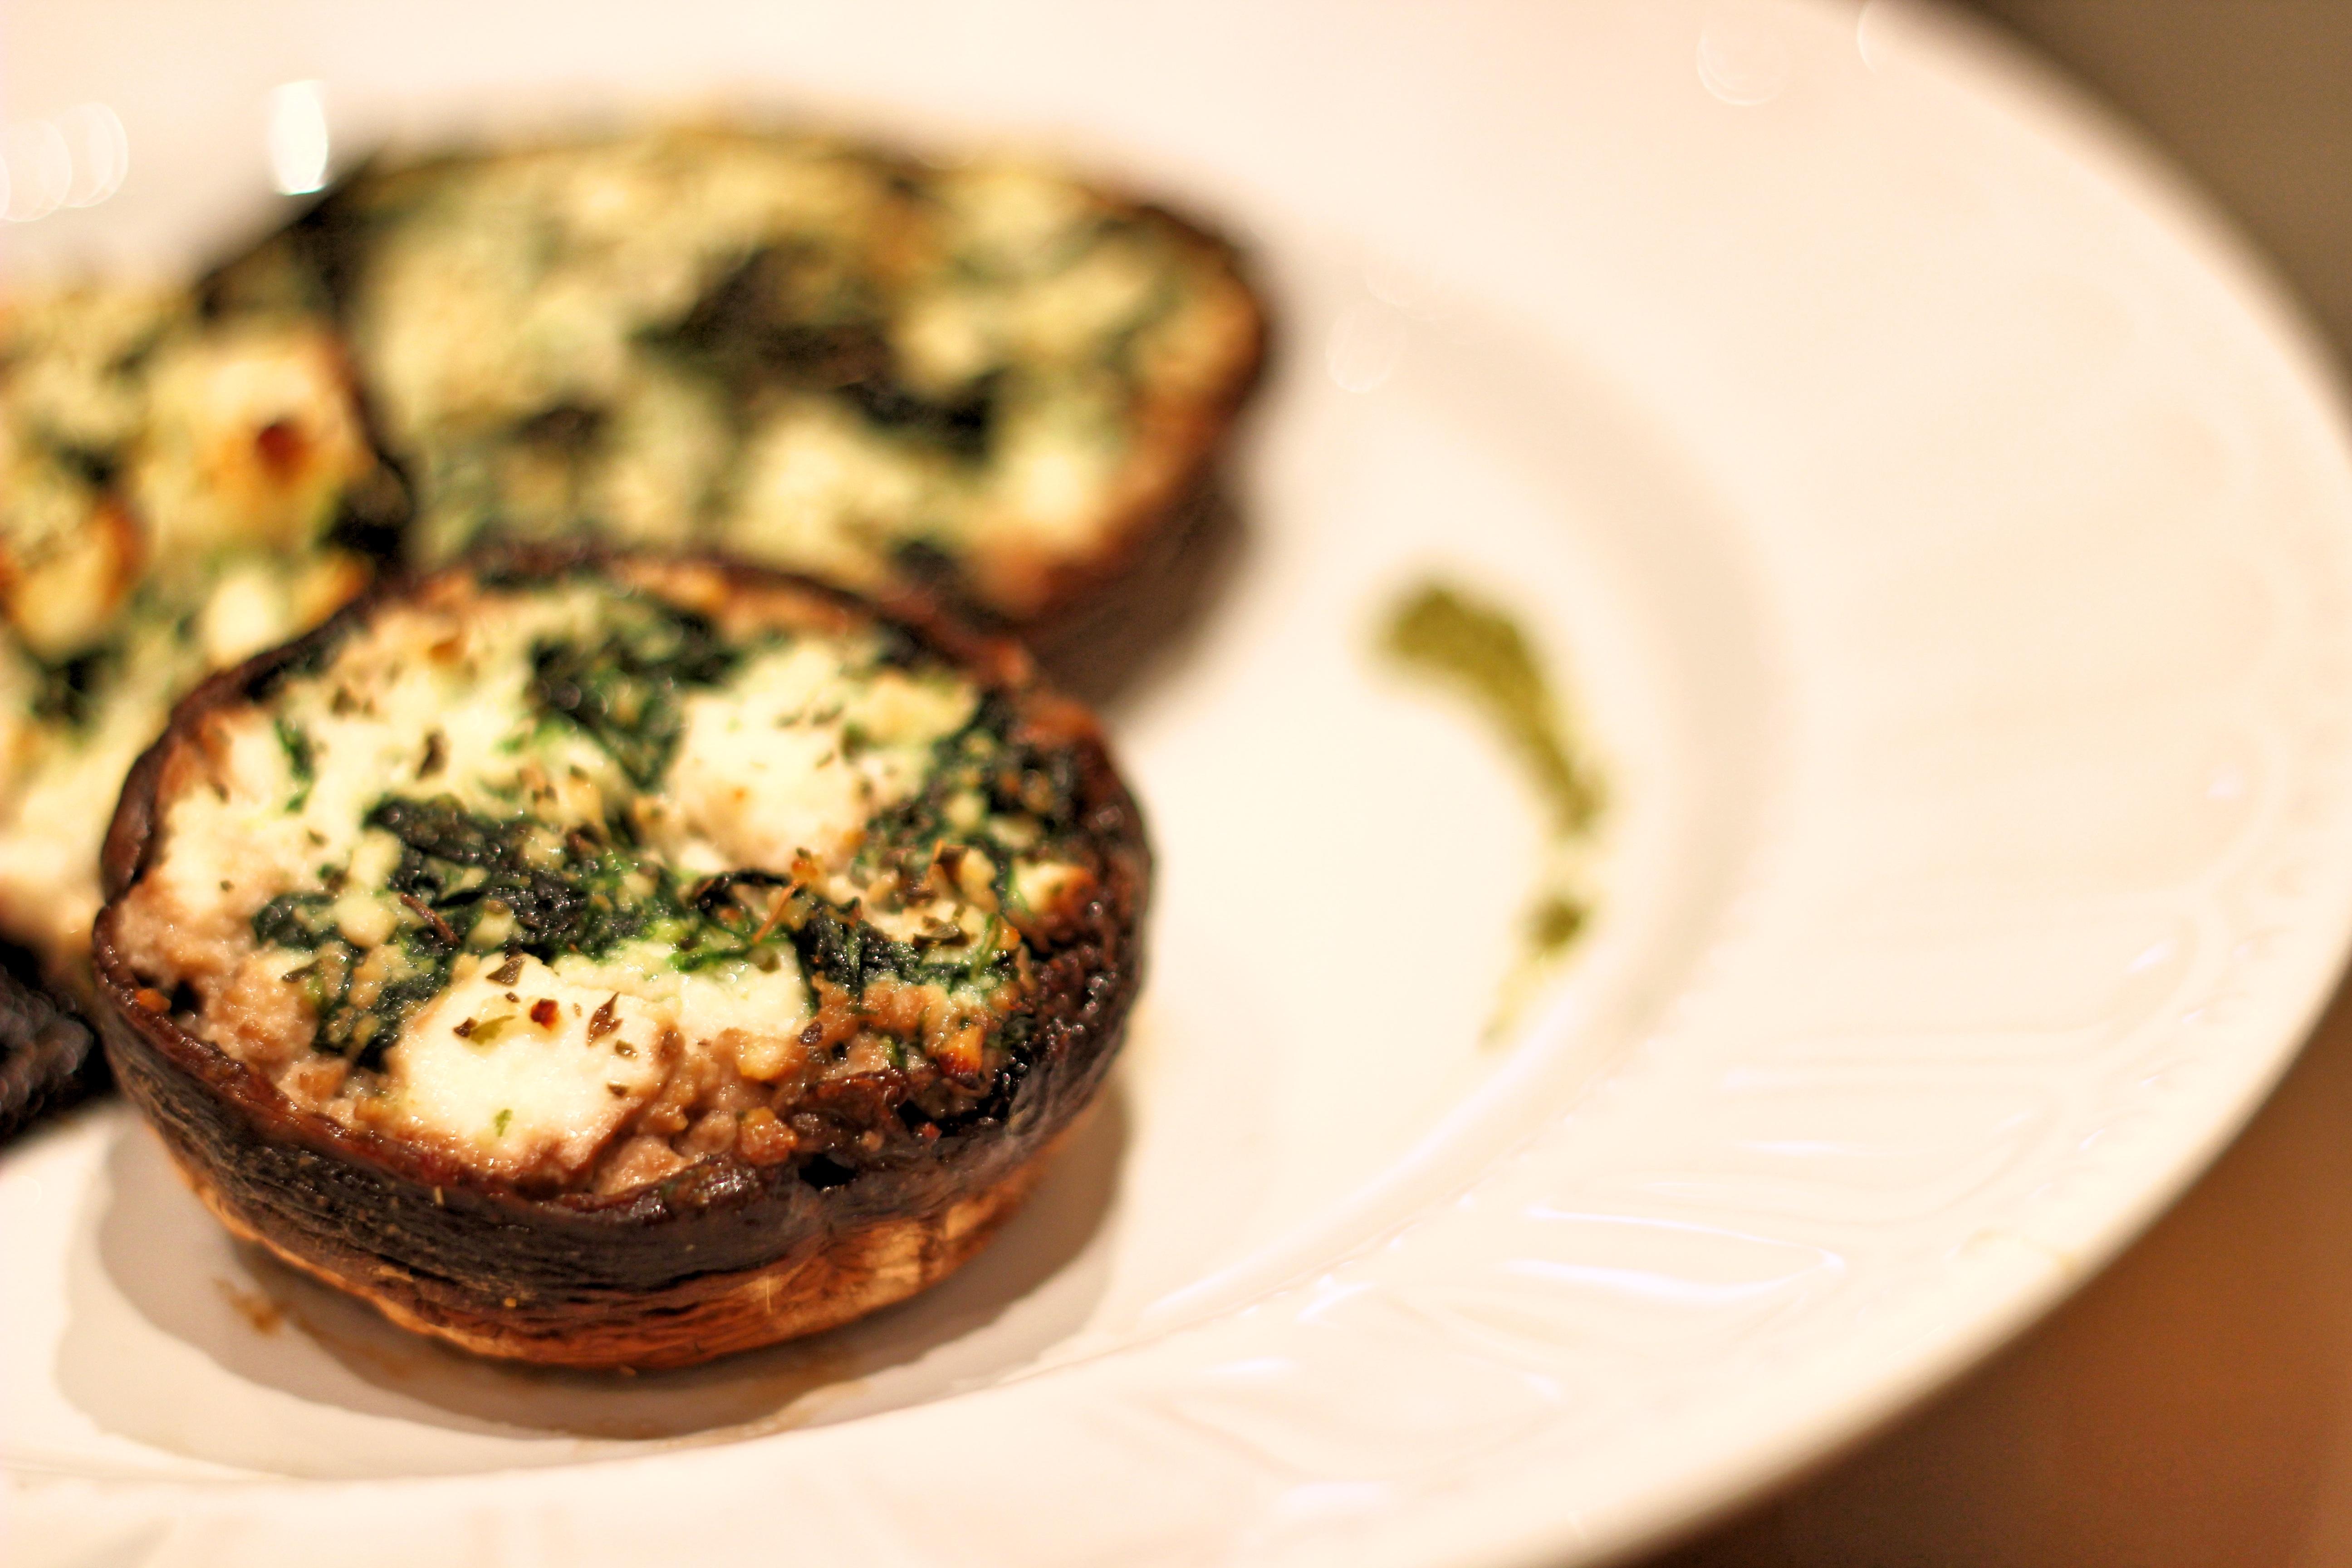 ... & Easy: Mediterranean Sea Bream, Zucchini rolls & Ricotta Mushrooms